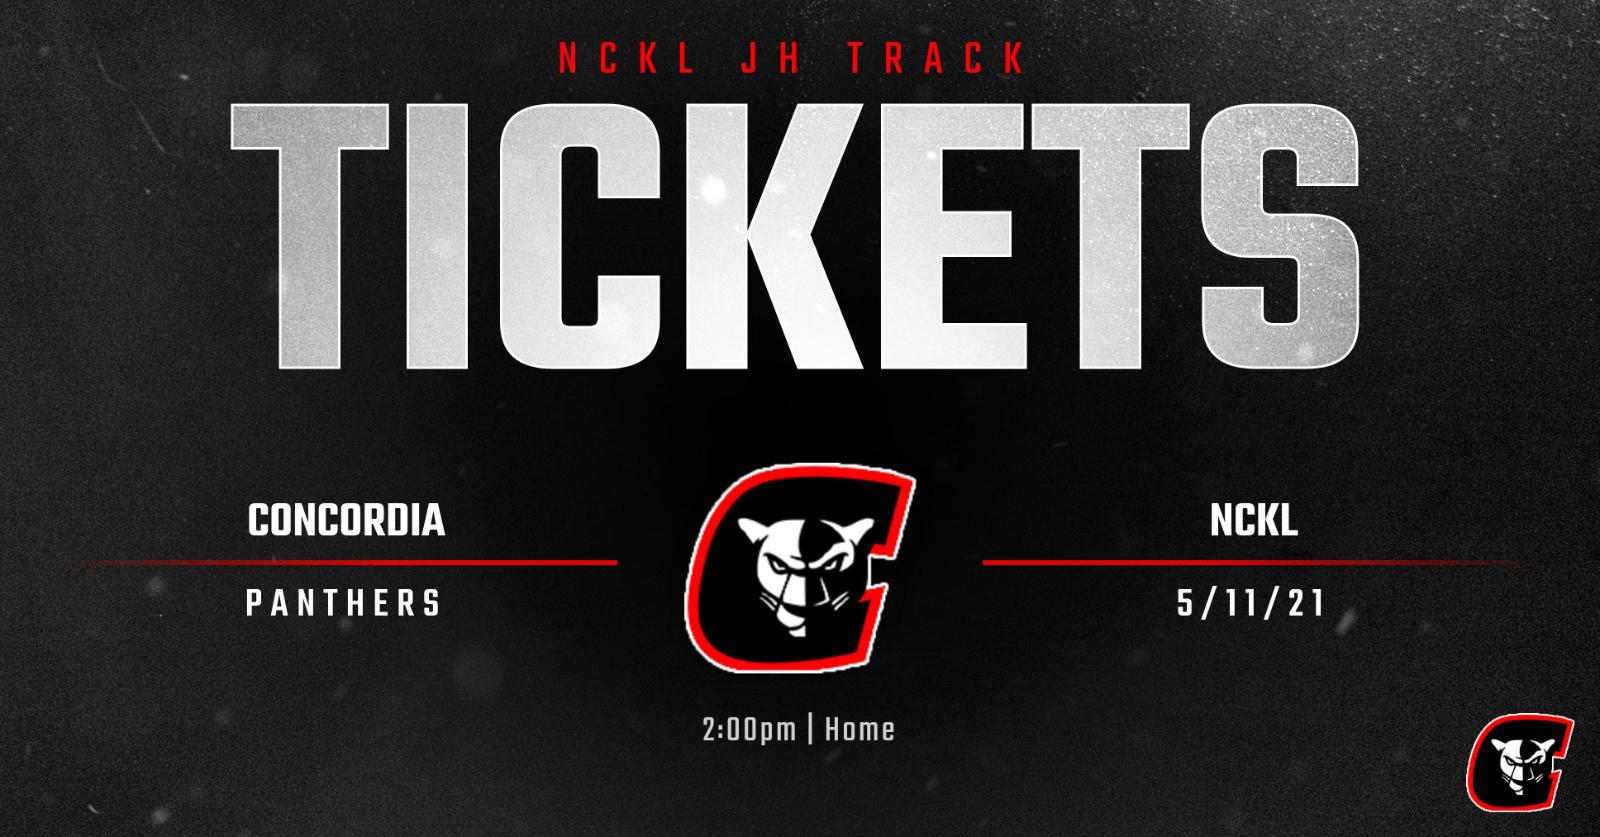 JH NCKL Track Meet Tickets 5/11